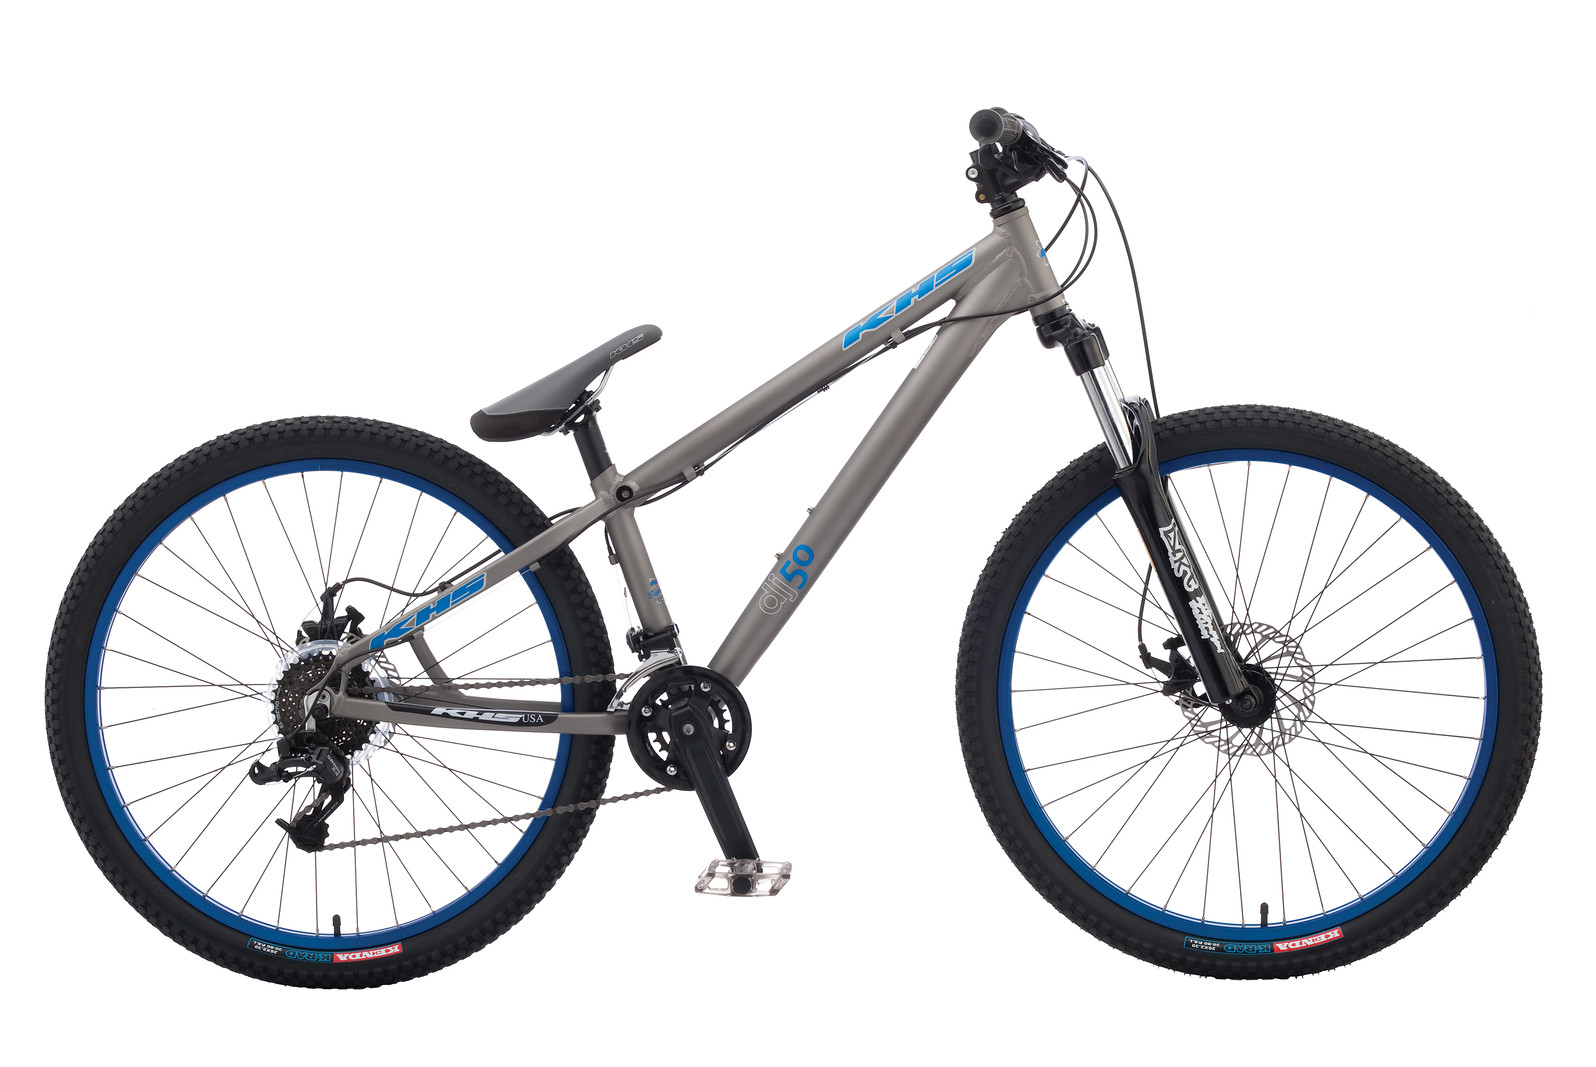 2013 KHS DJ50 Bike 2013 DJ50